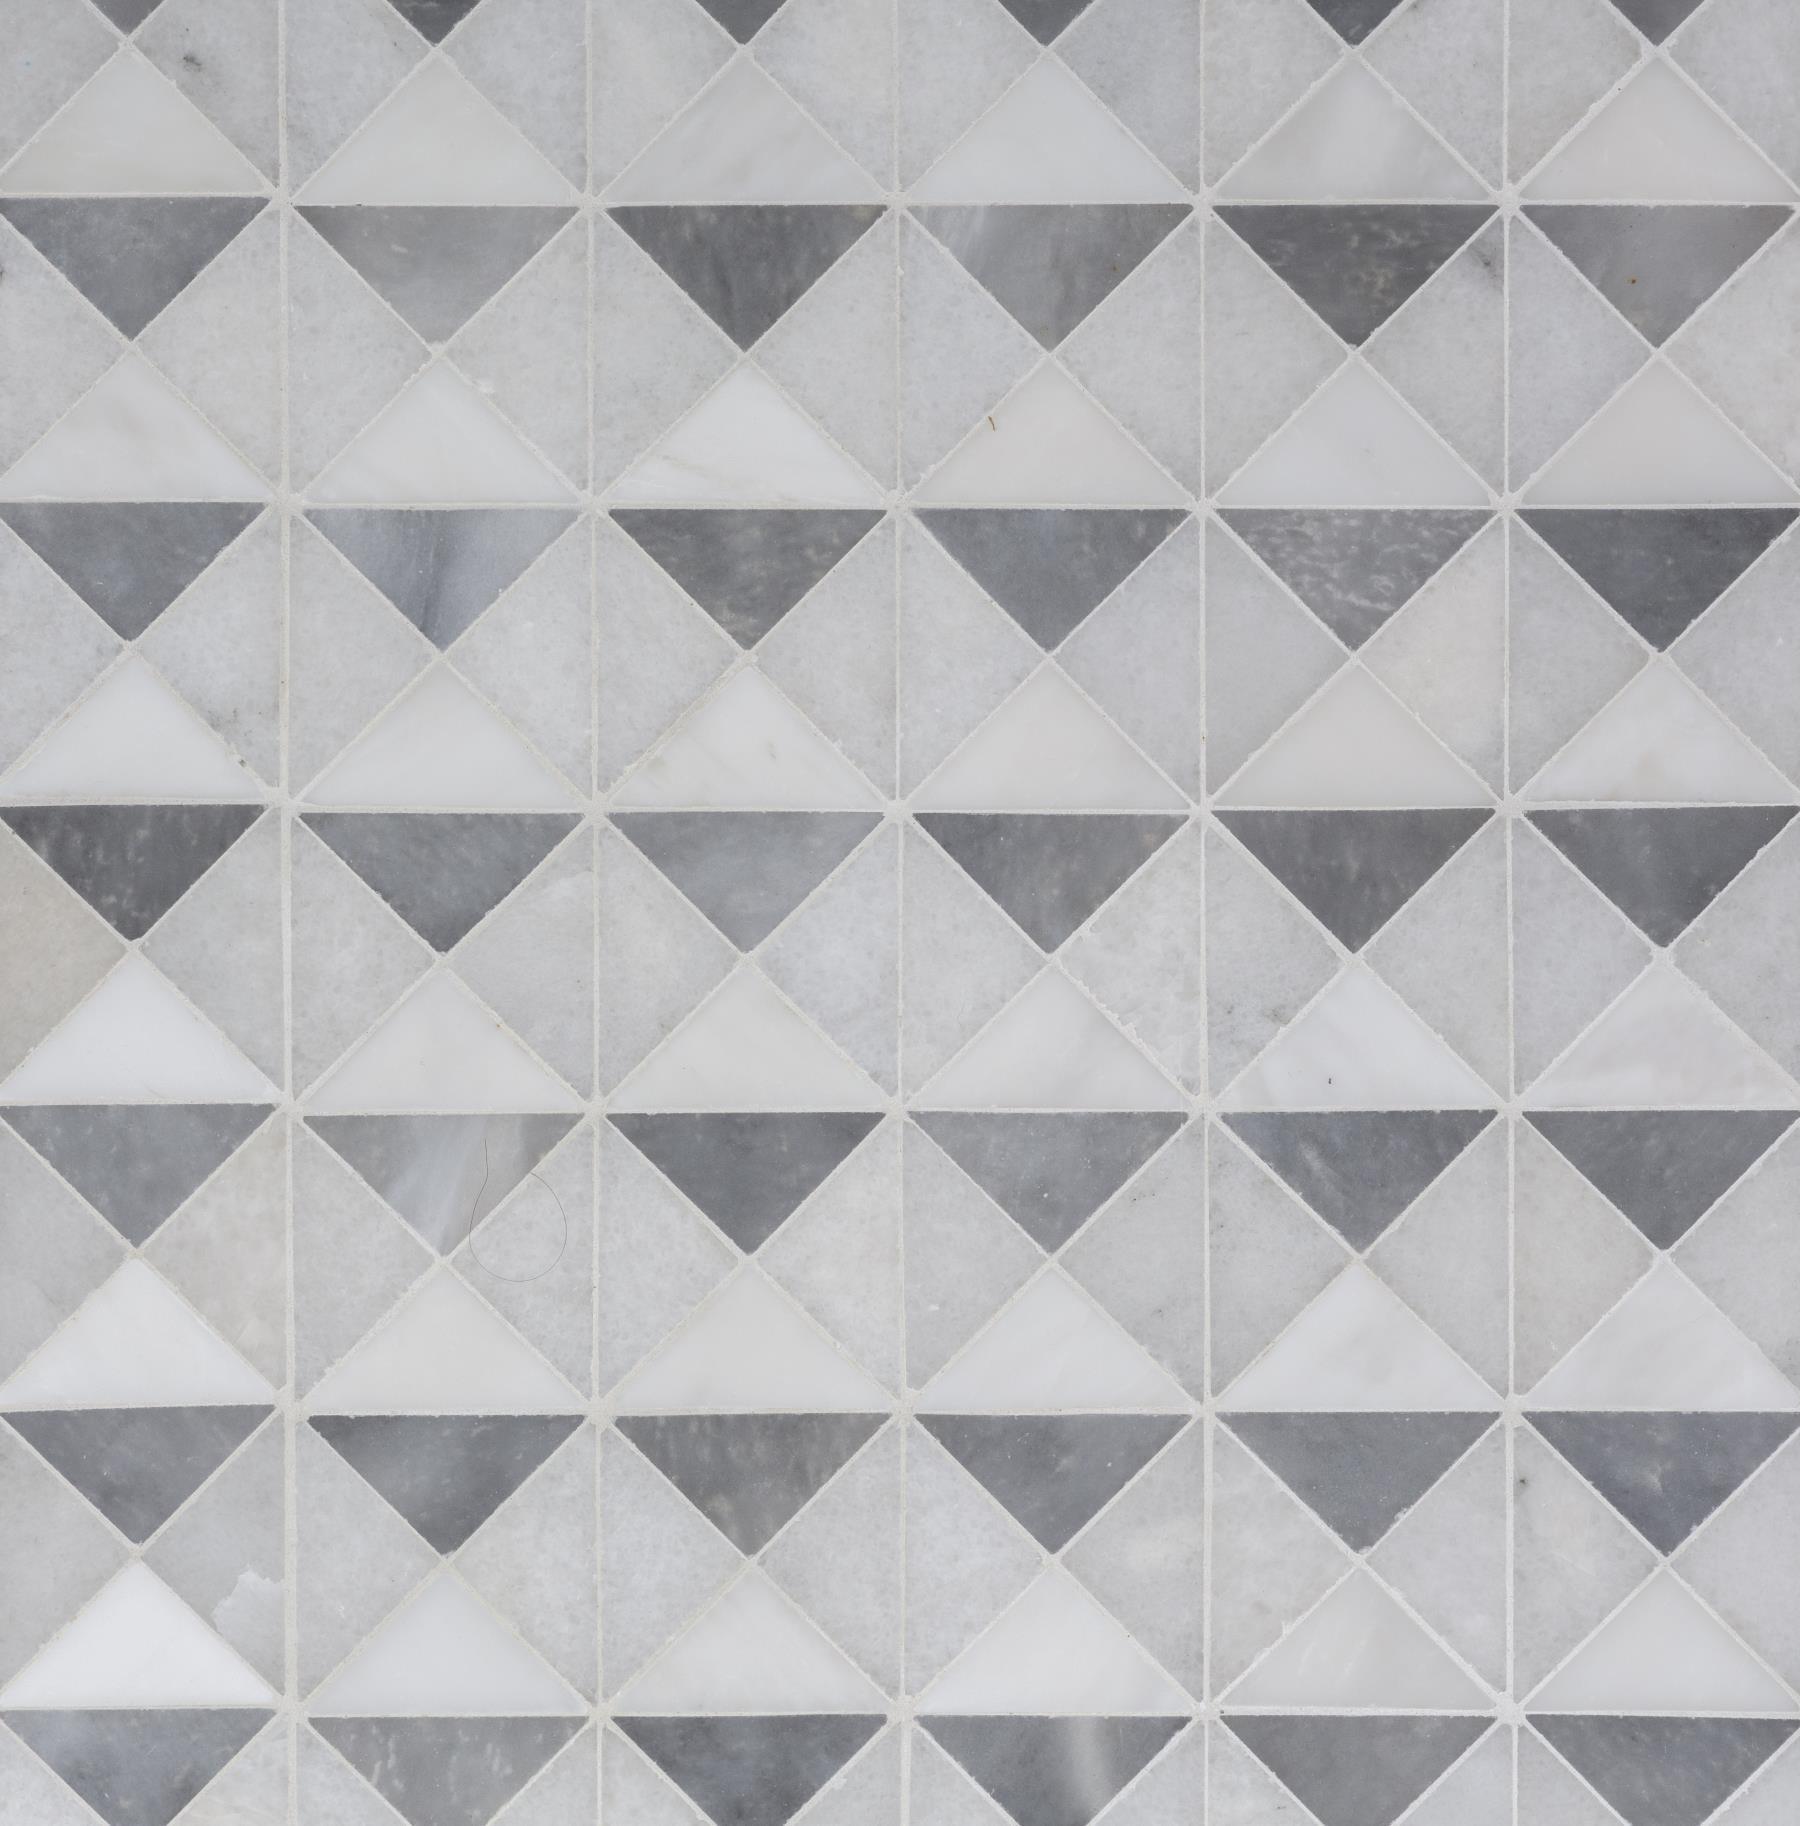 Interior-desiInterior-design-arkansas-bathroom-refresh-gn-arkansas-midcentuKrista-Lewis-002